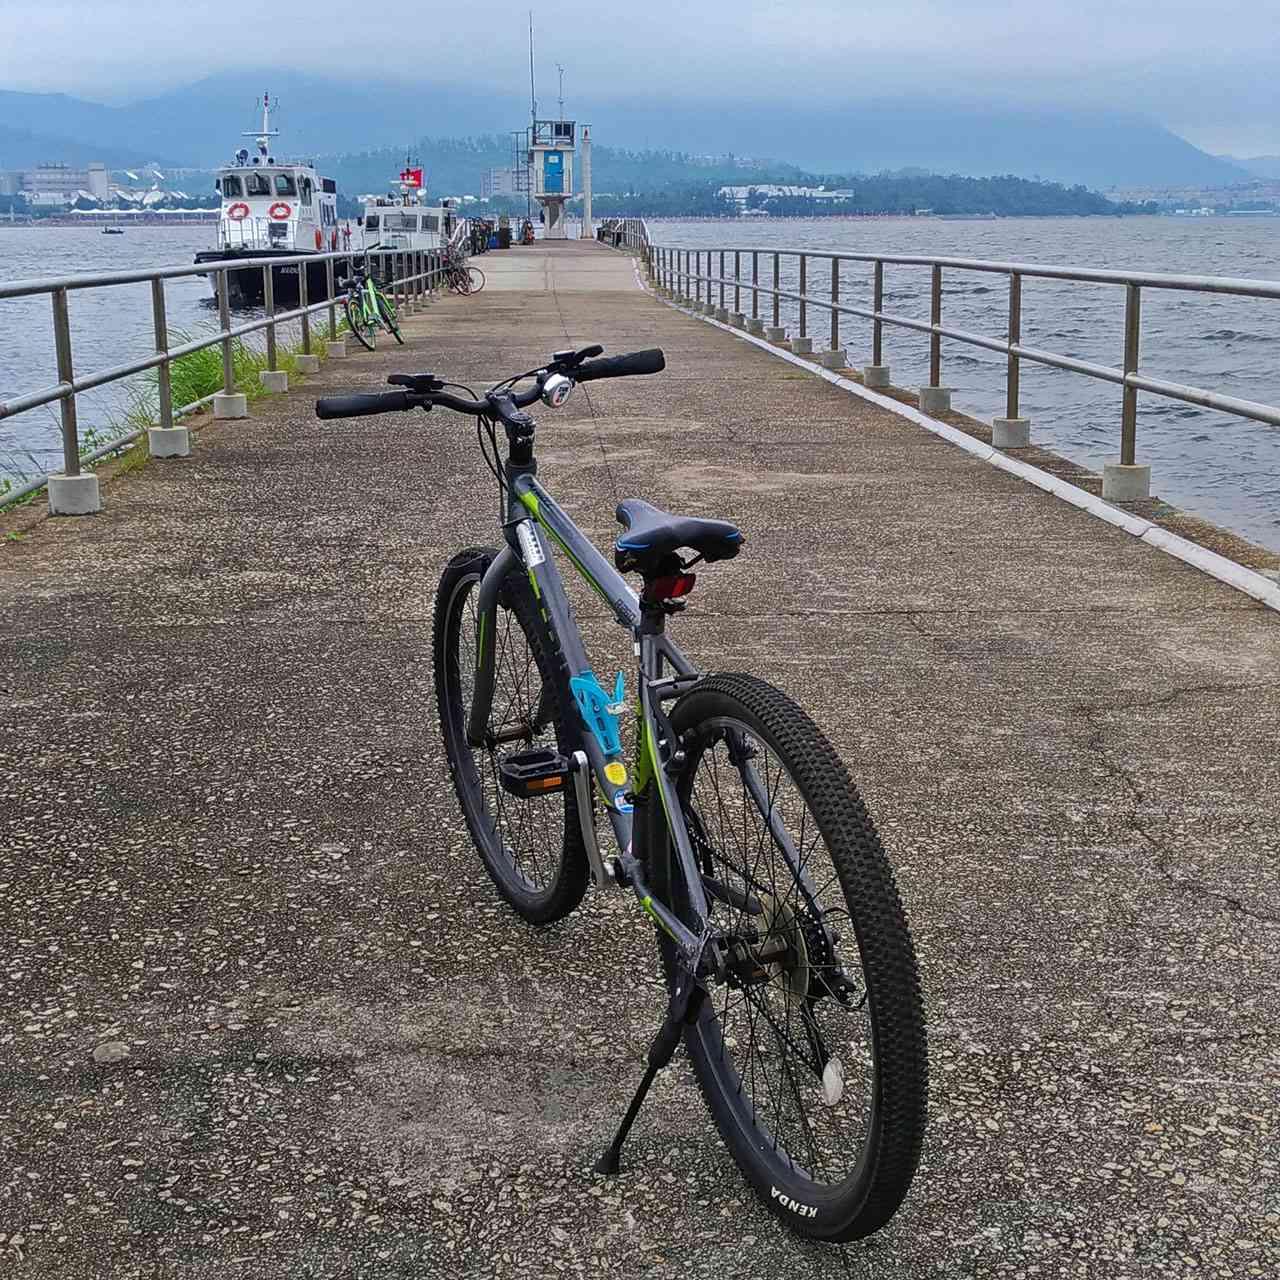 Bike on Tolo Harbour wharf, Hong Kong